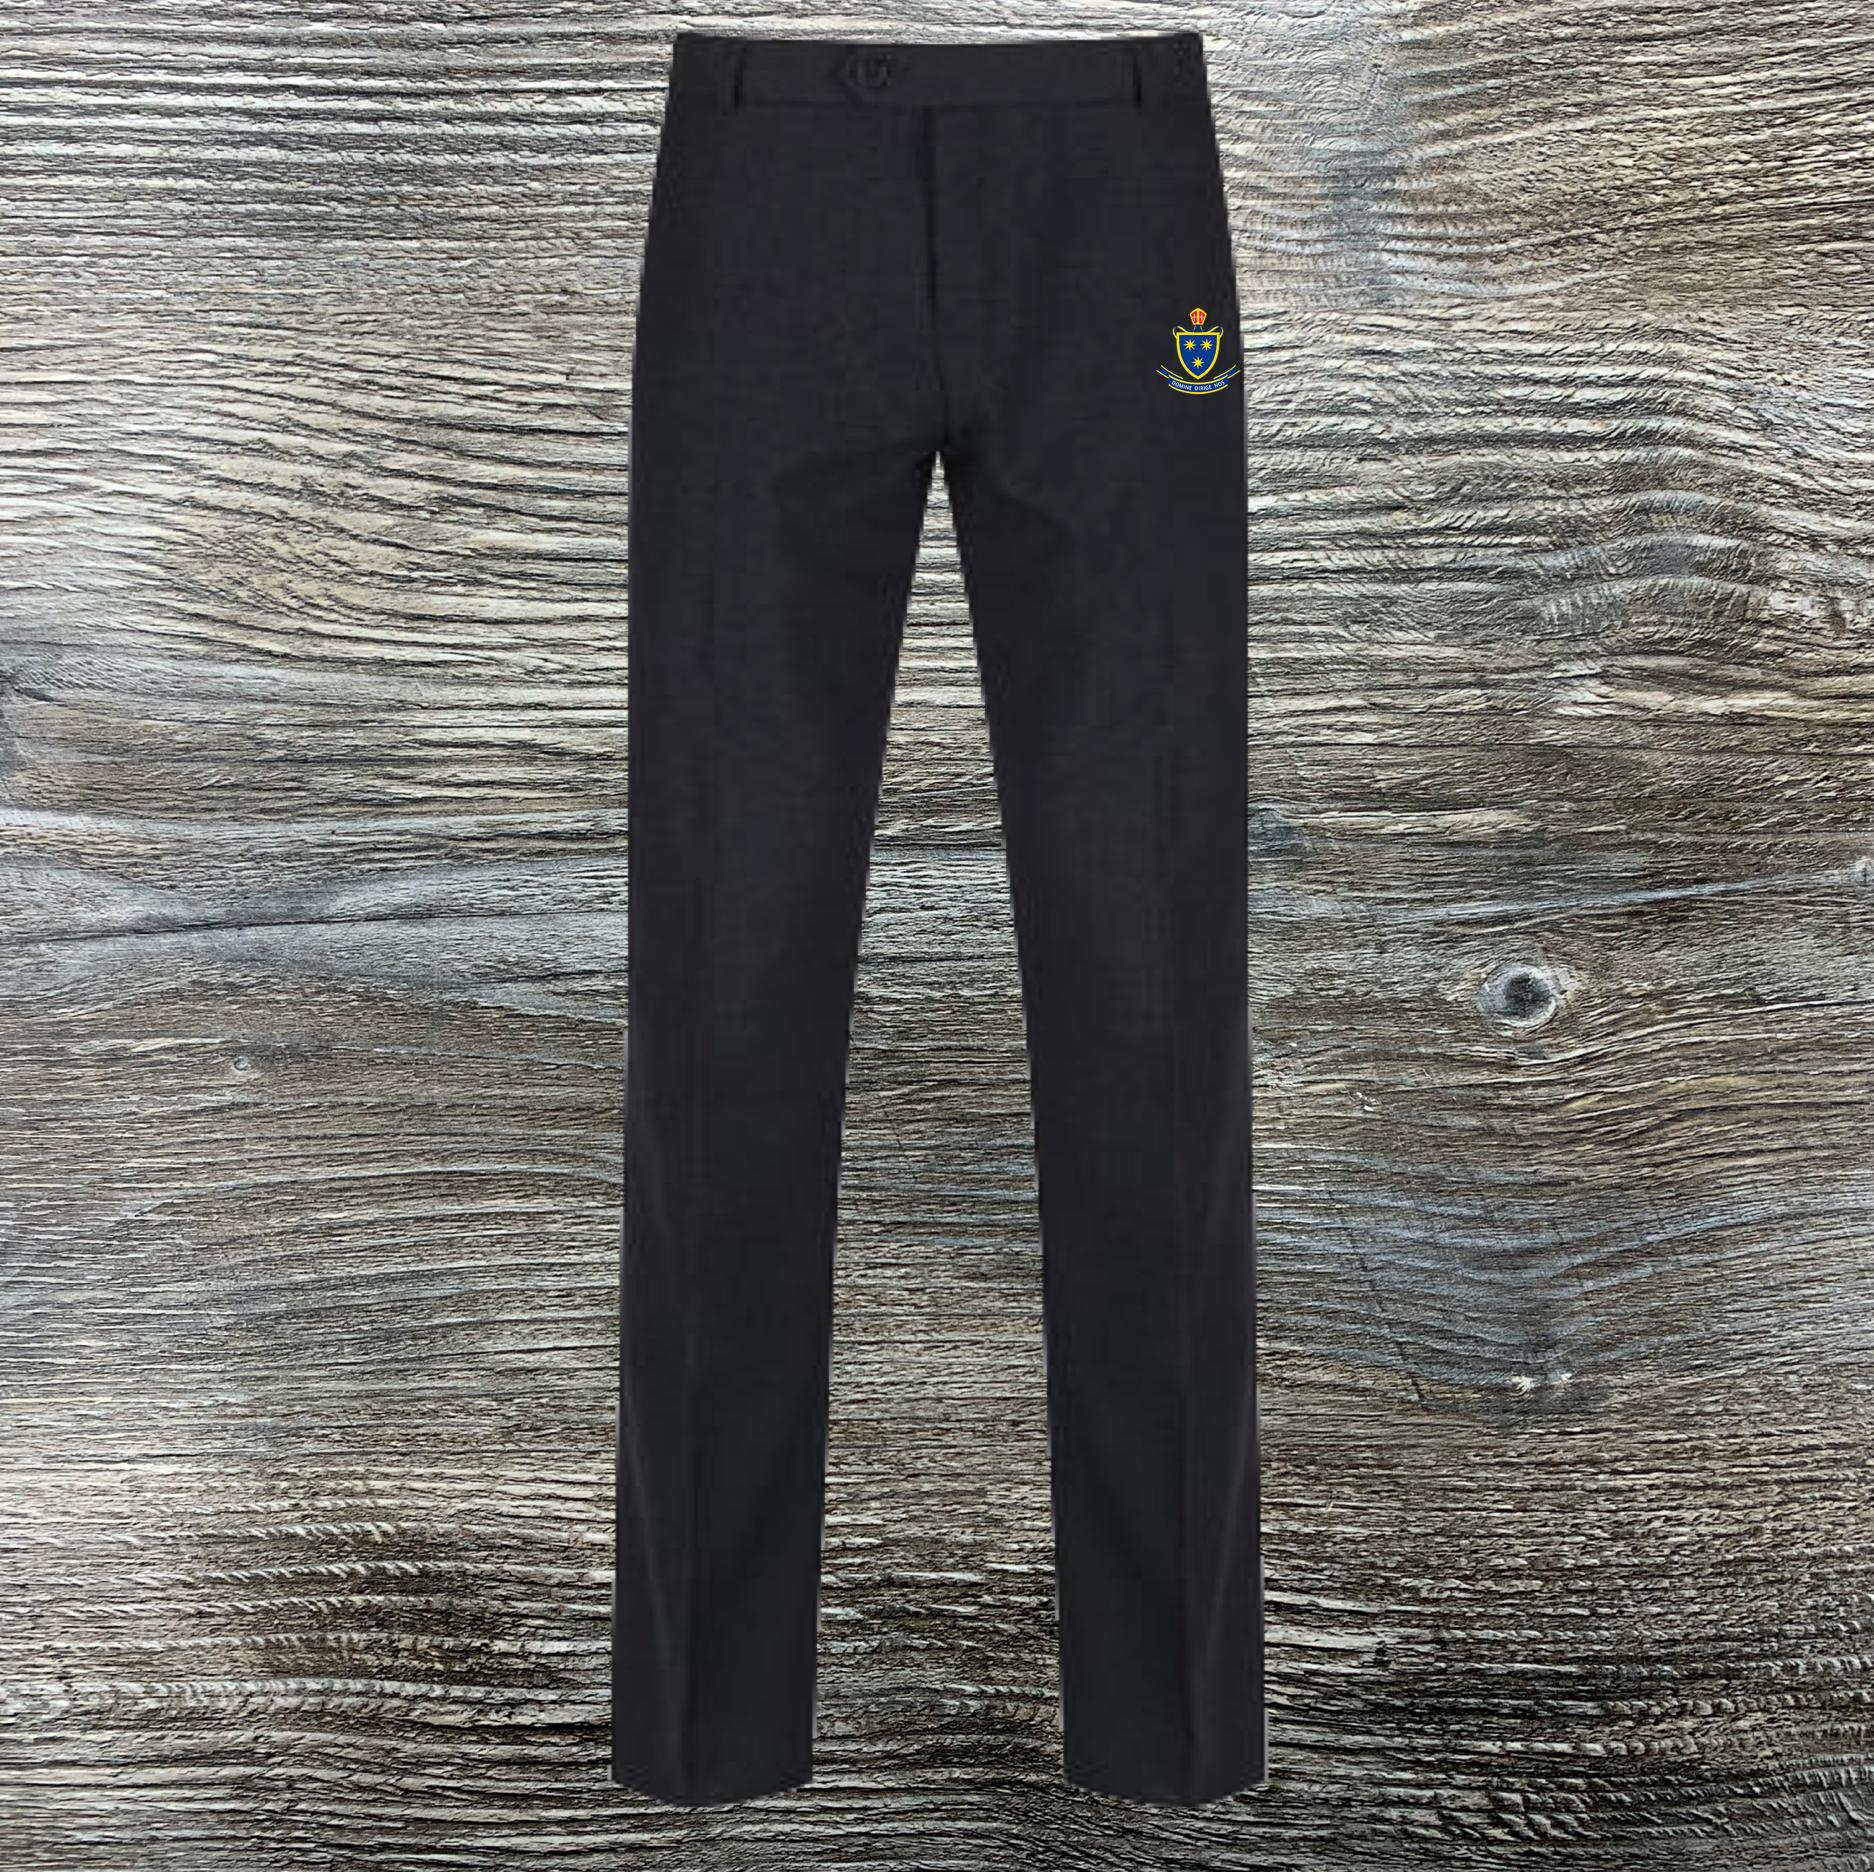 St Wilfrid's Boys Trutex Charcoal Trousers